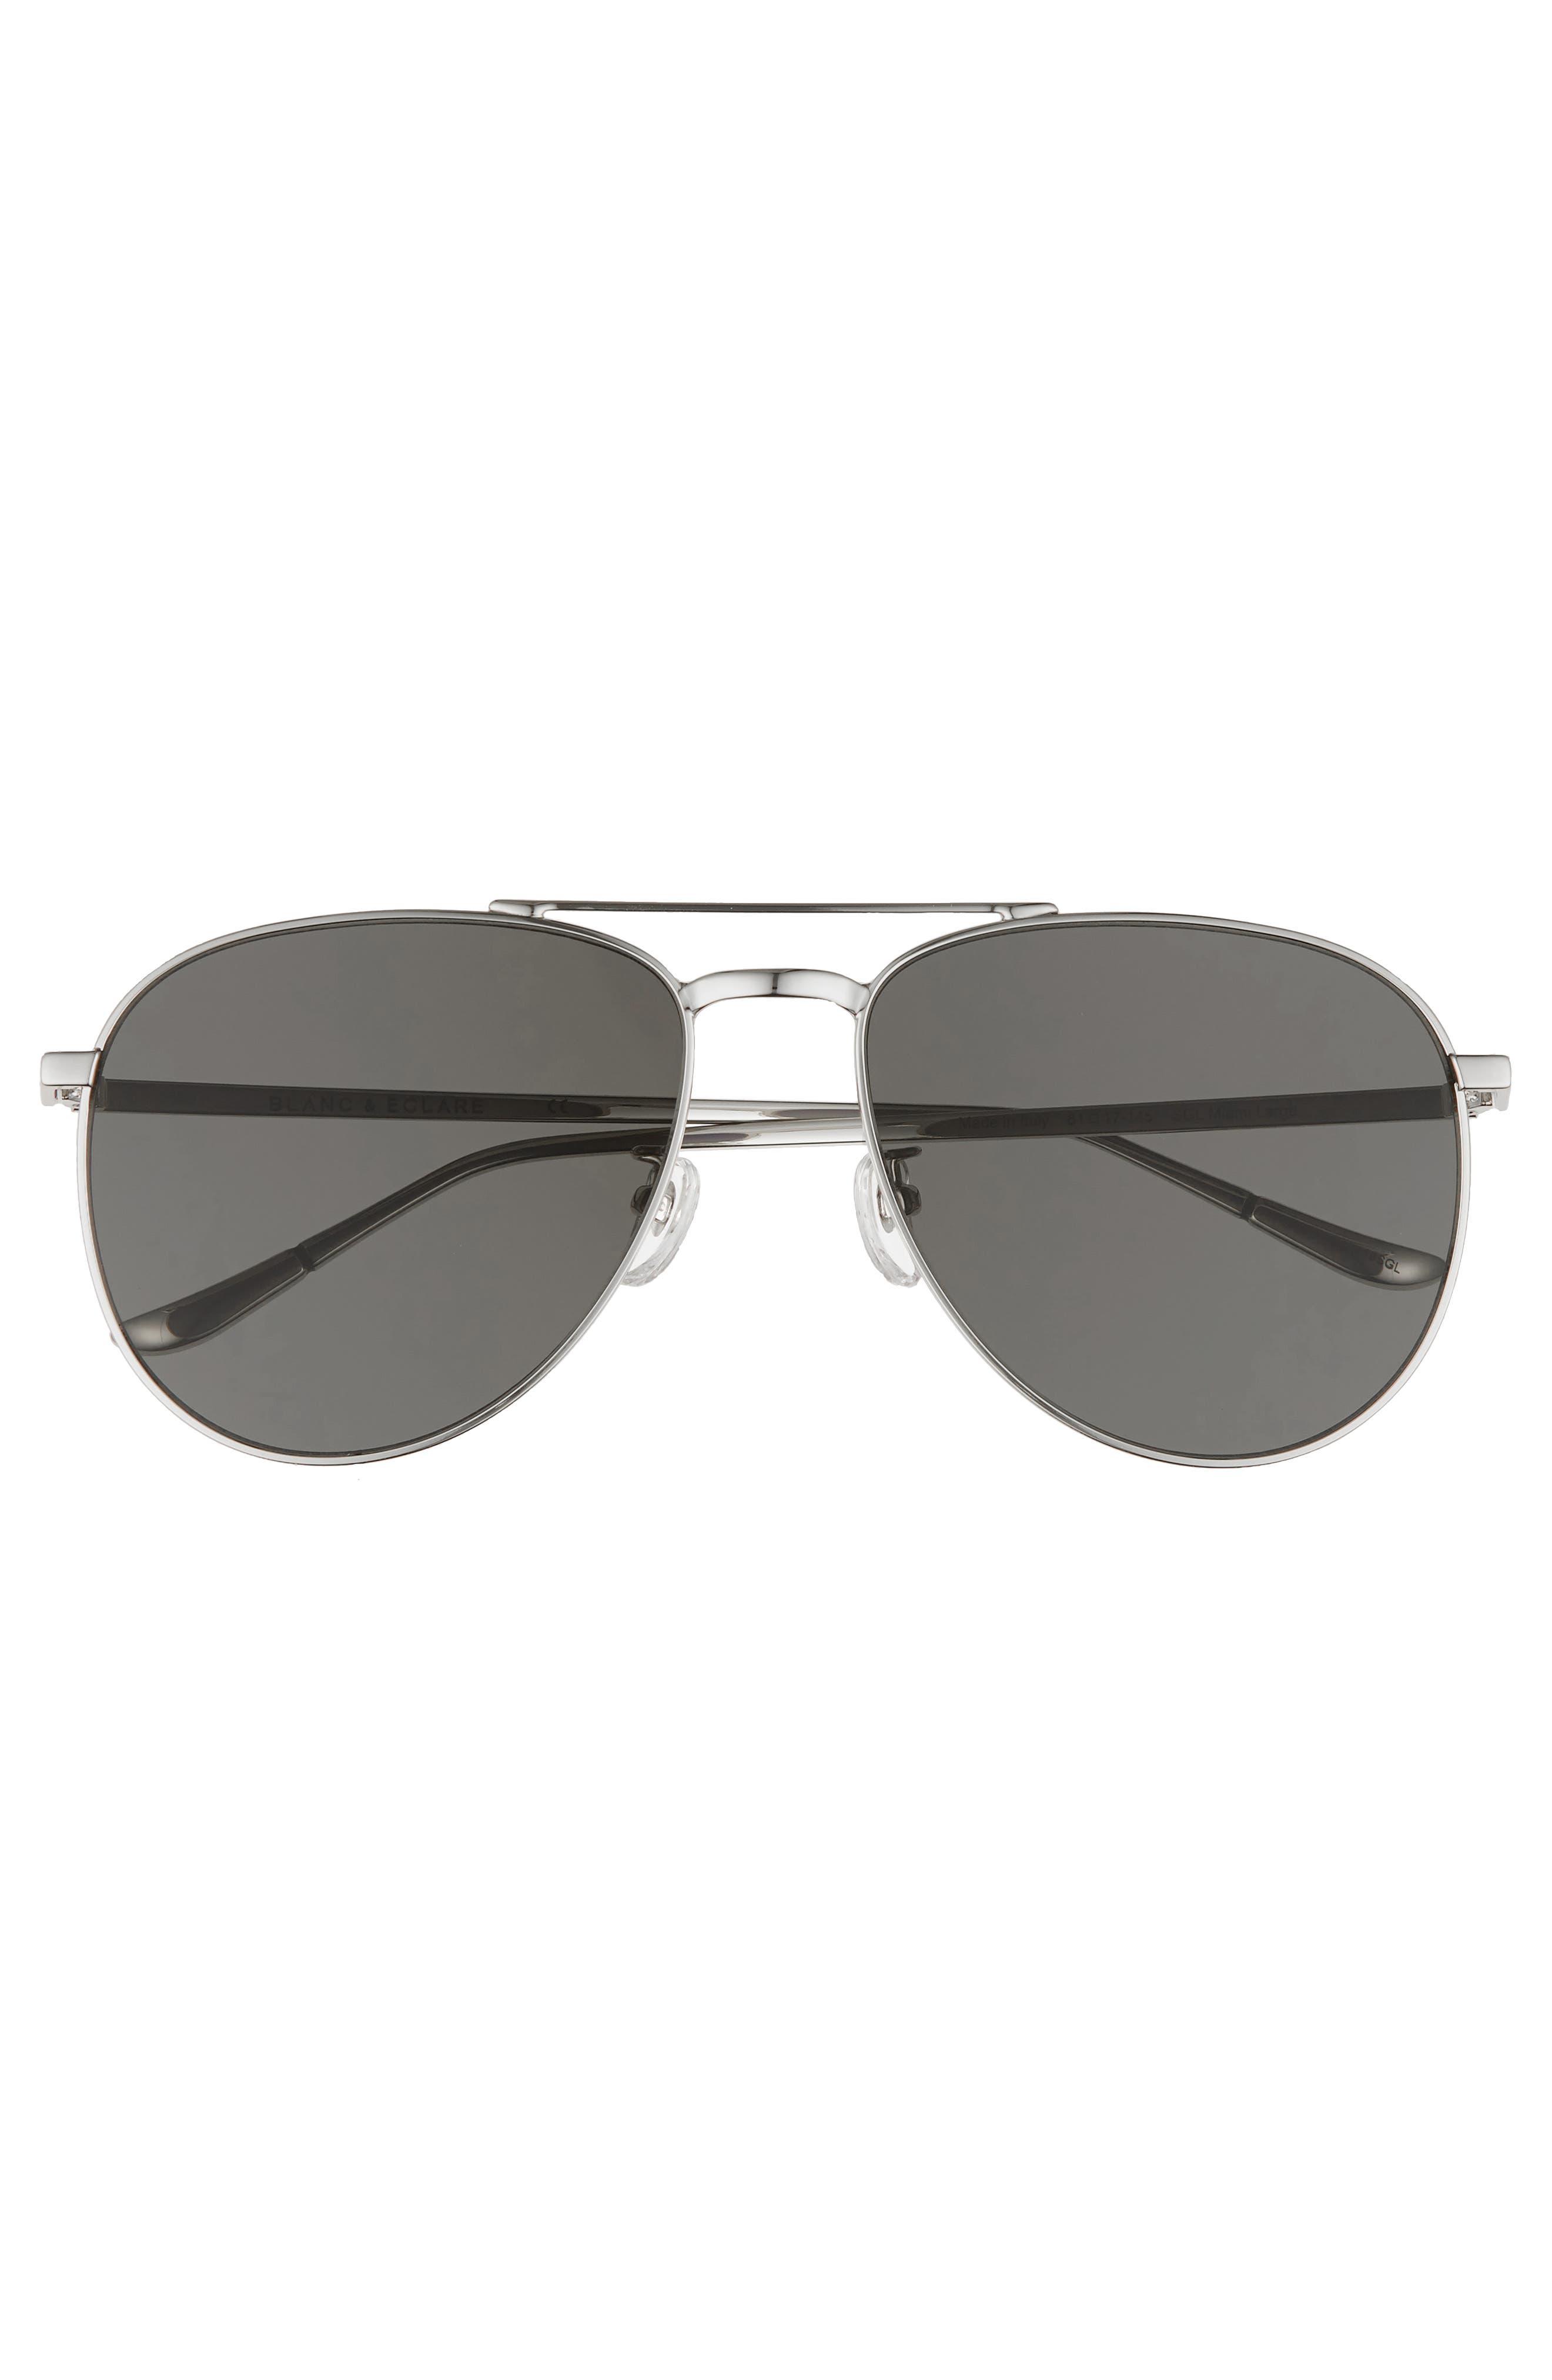 BLANC & ECLARE Miami 61mm Large Polarized Aviator Sunglasses,                             Alternate thumbnail 3, color,                             040